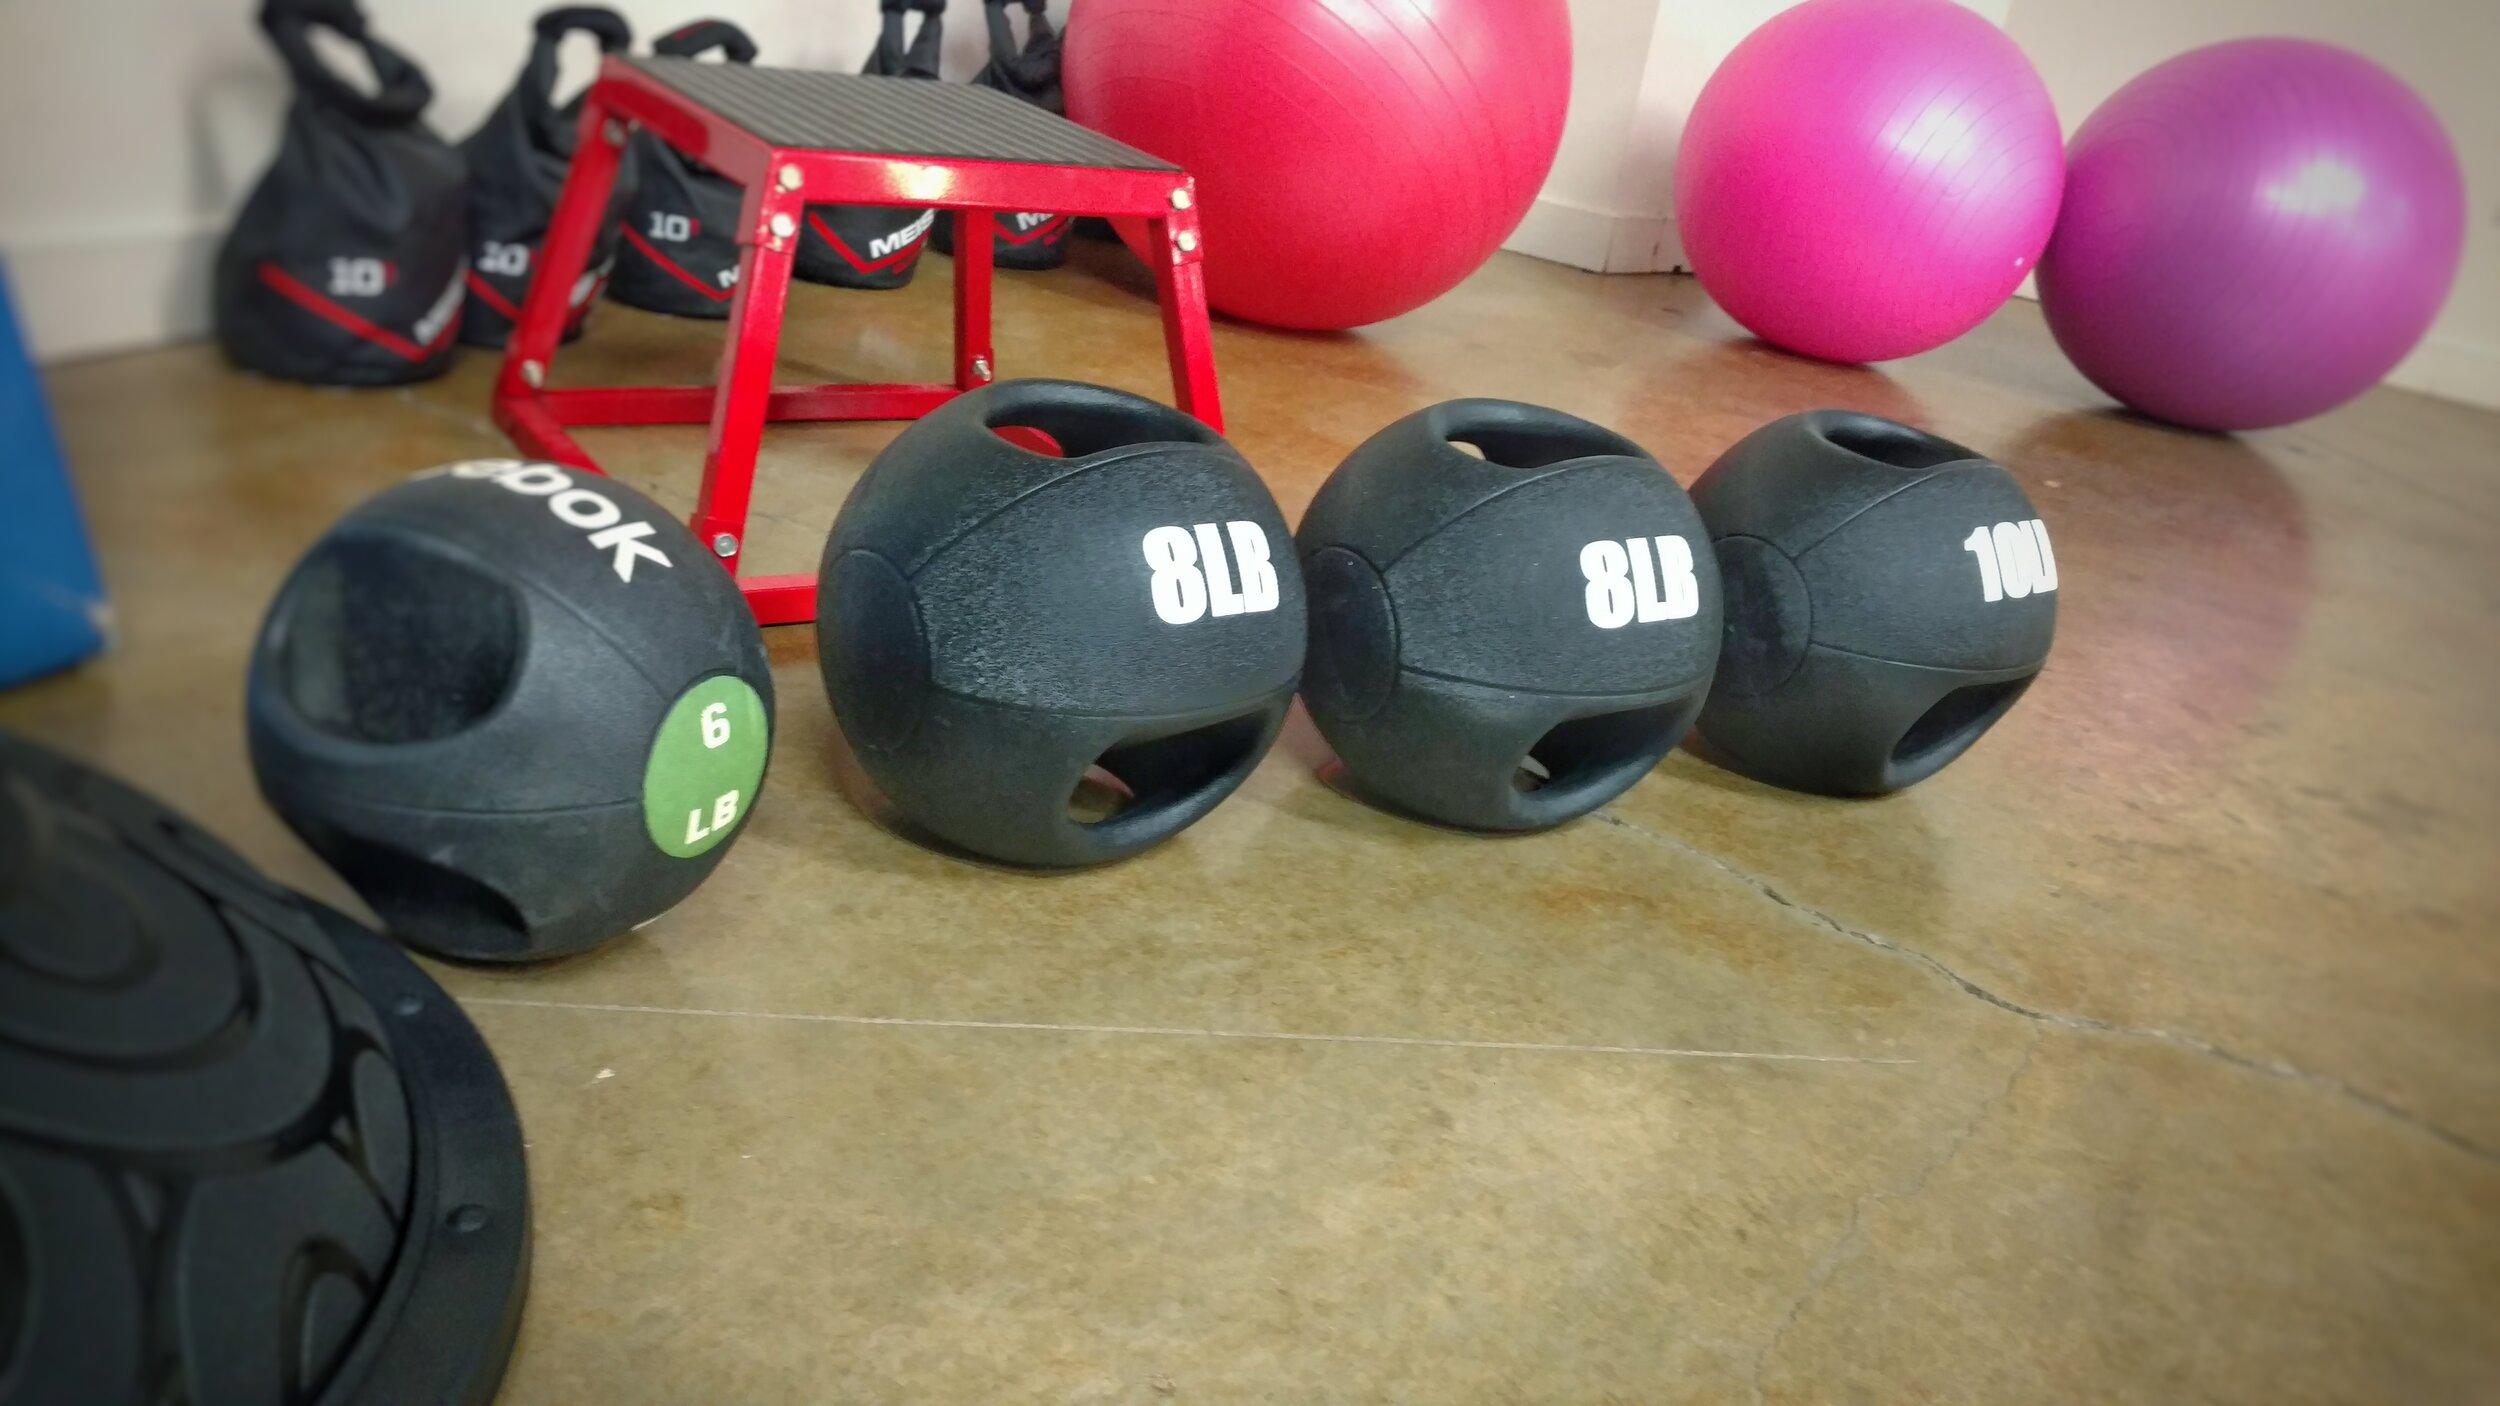 Exercise Balls Kinds Sizes With Exercises Dale Maynor Fitness Training